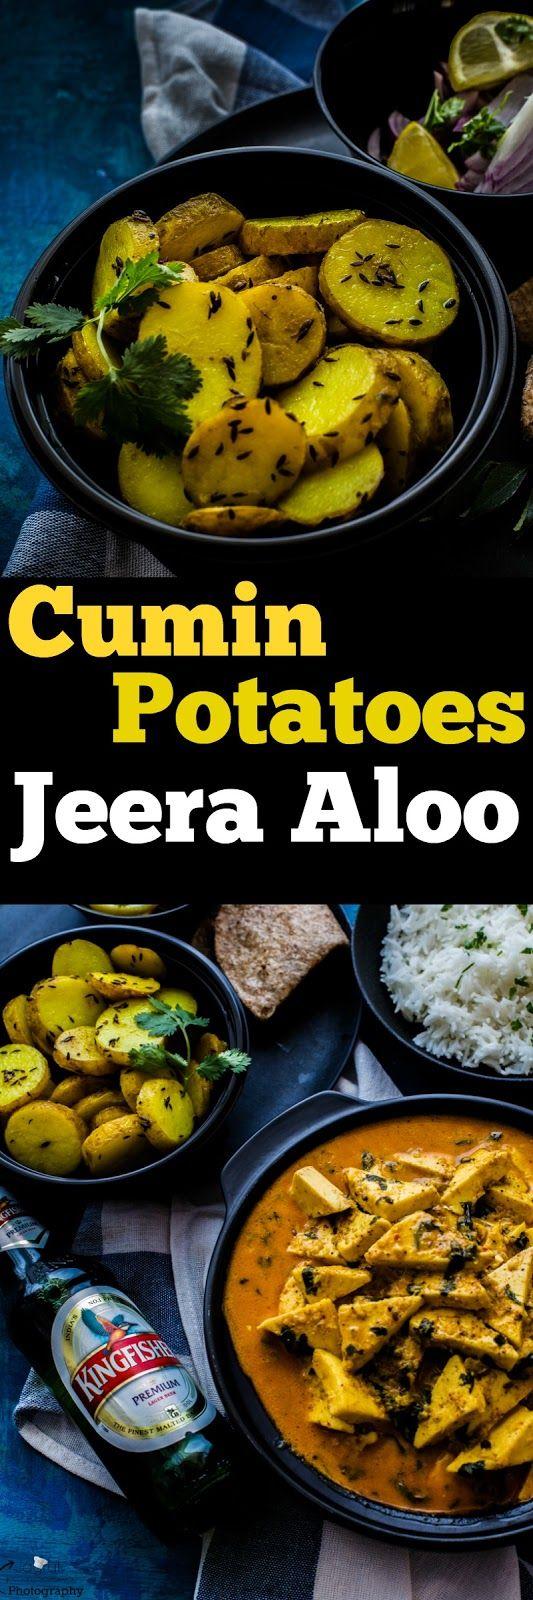 Jagruti's Cooking Odyssey: Cumin Potatoes - Jeera Aloo - National Curry Week 2016